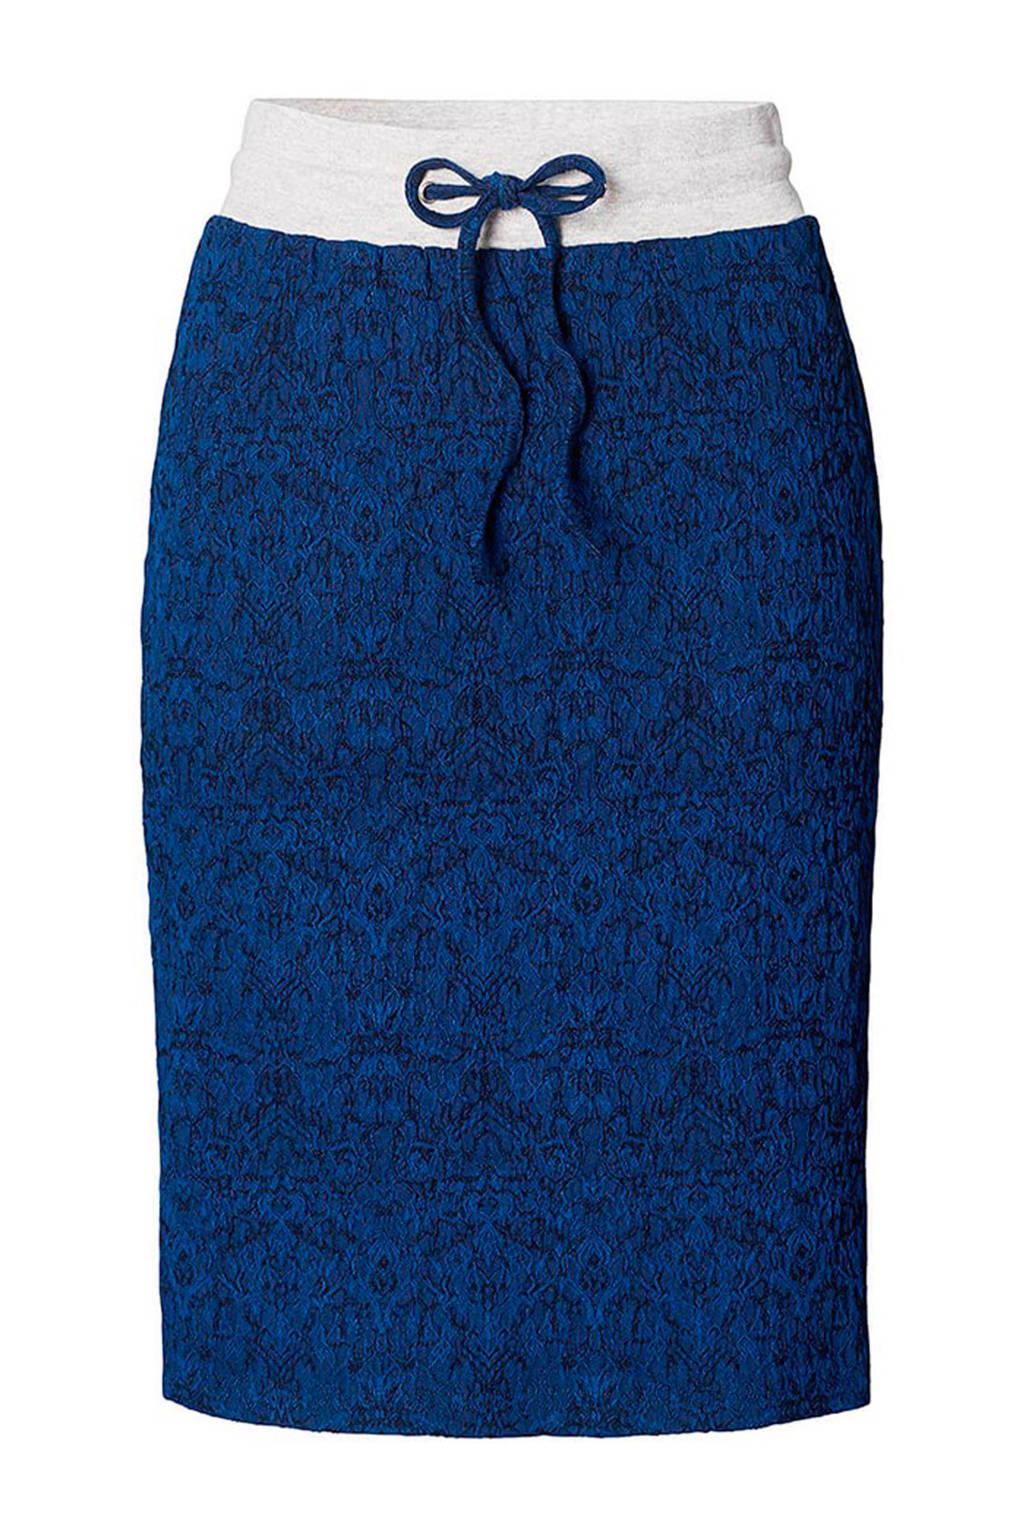 La Ligna rok, Blauw